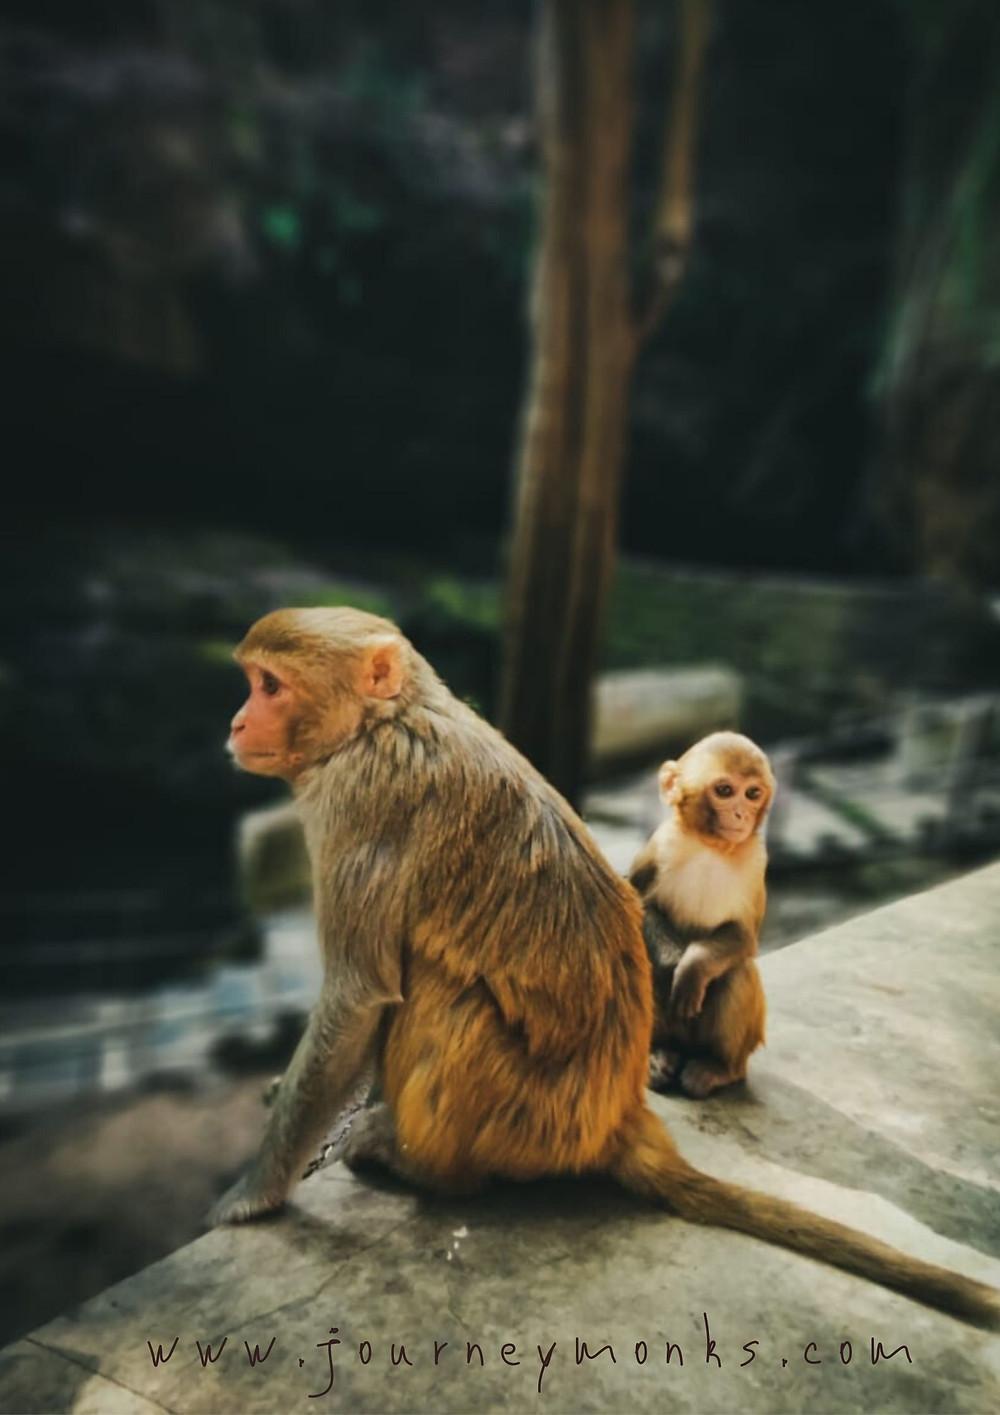 Cute Animal wallpaper,cute animals,monkey,cute monkey,monkey picture,wallpaper for mobile,pc wallpaper,monkey wallpaper.